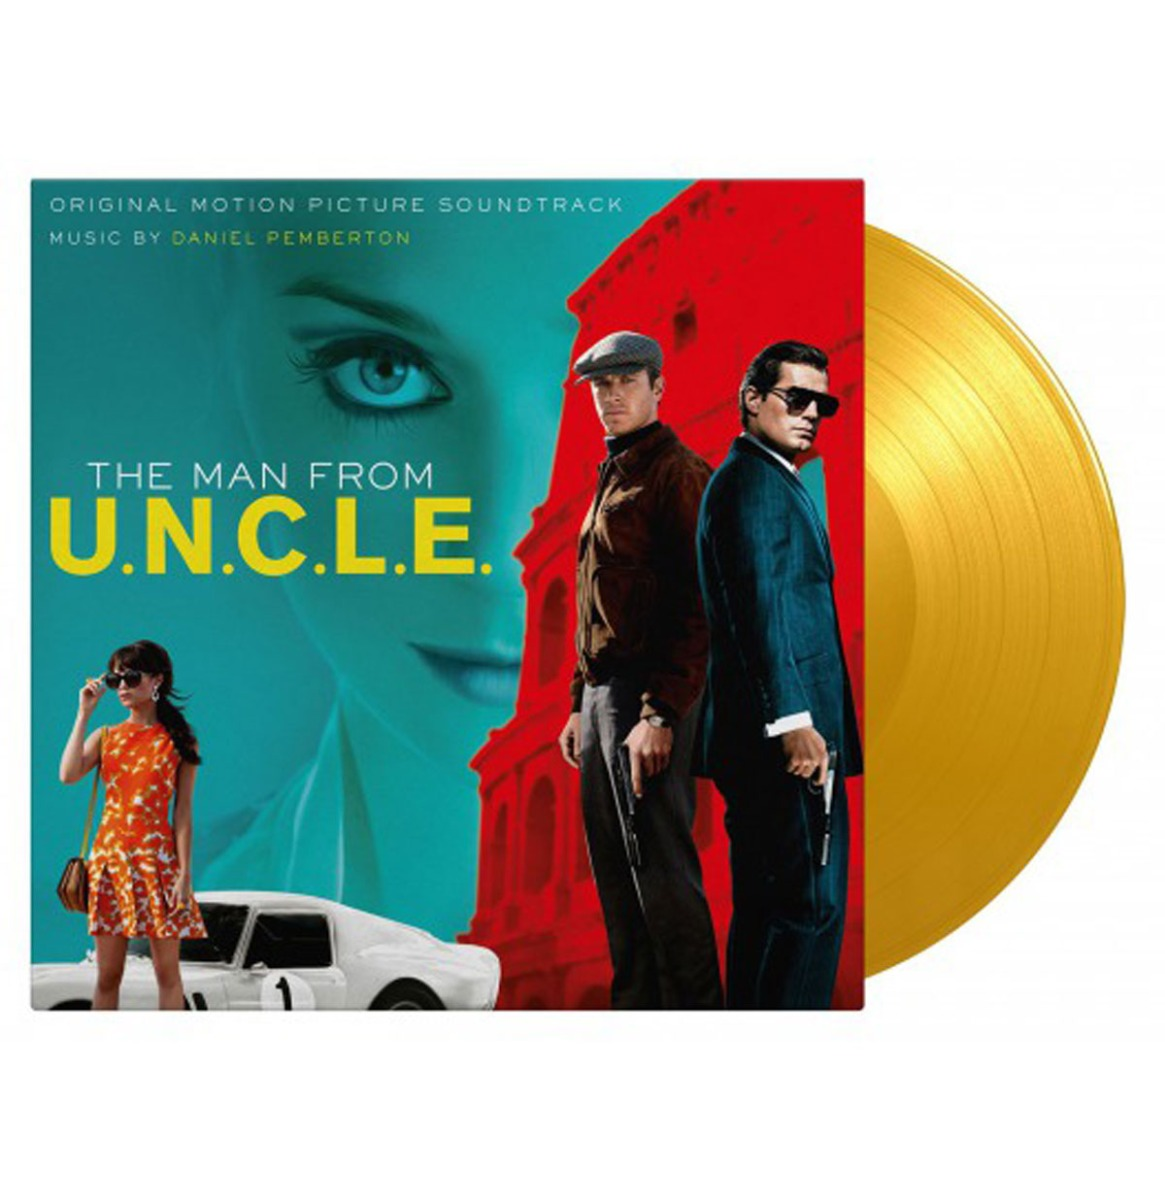 Original Soundtrack - The Man From U.N.C.L.E. (Daniel Pemberton) Gekleurd Vinyl 2LP